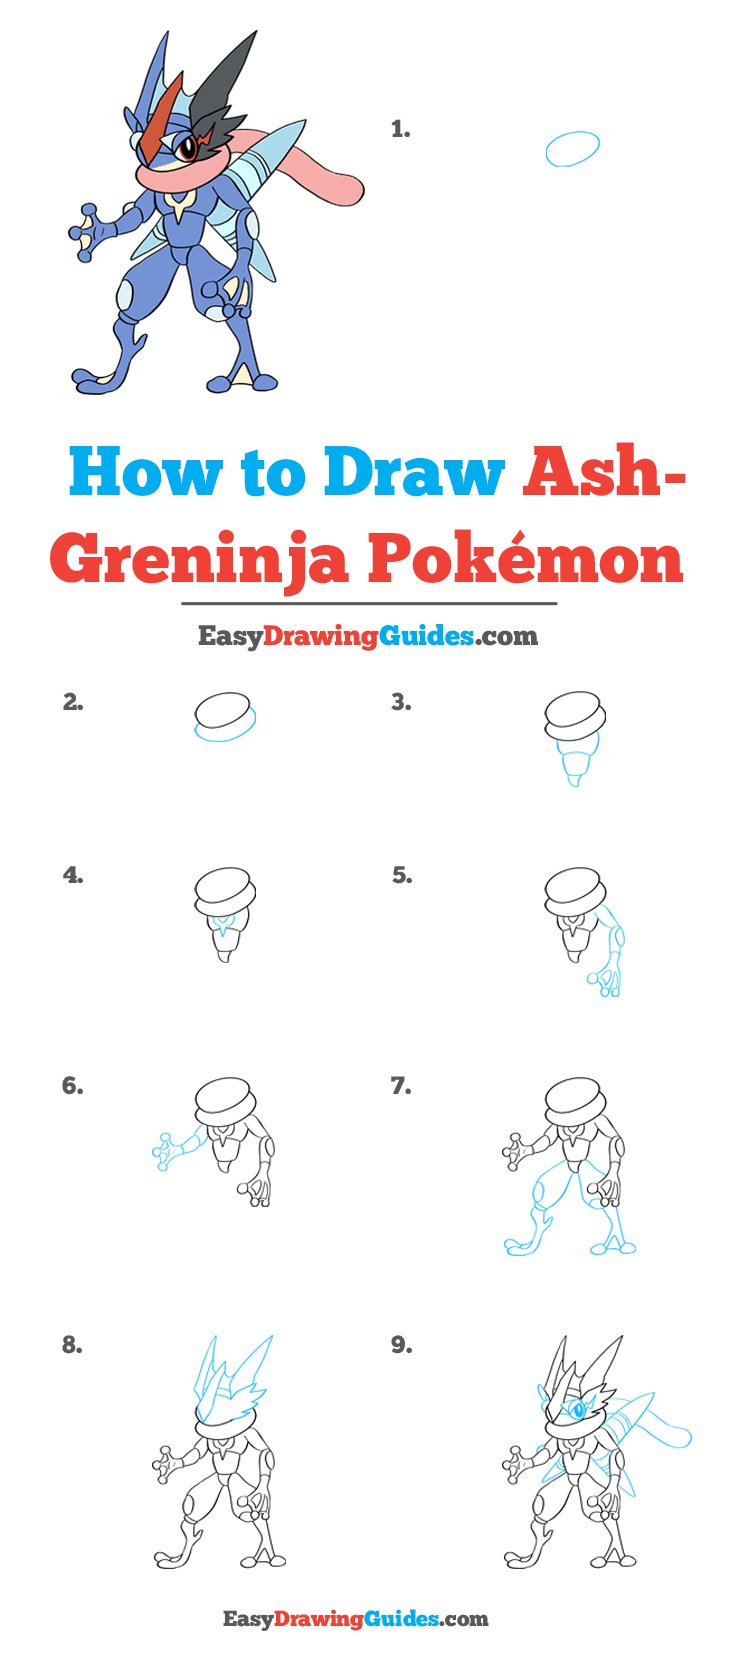 How to Draw Ash Greninja Pokémon Step by Step Tutorial Image